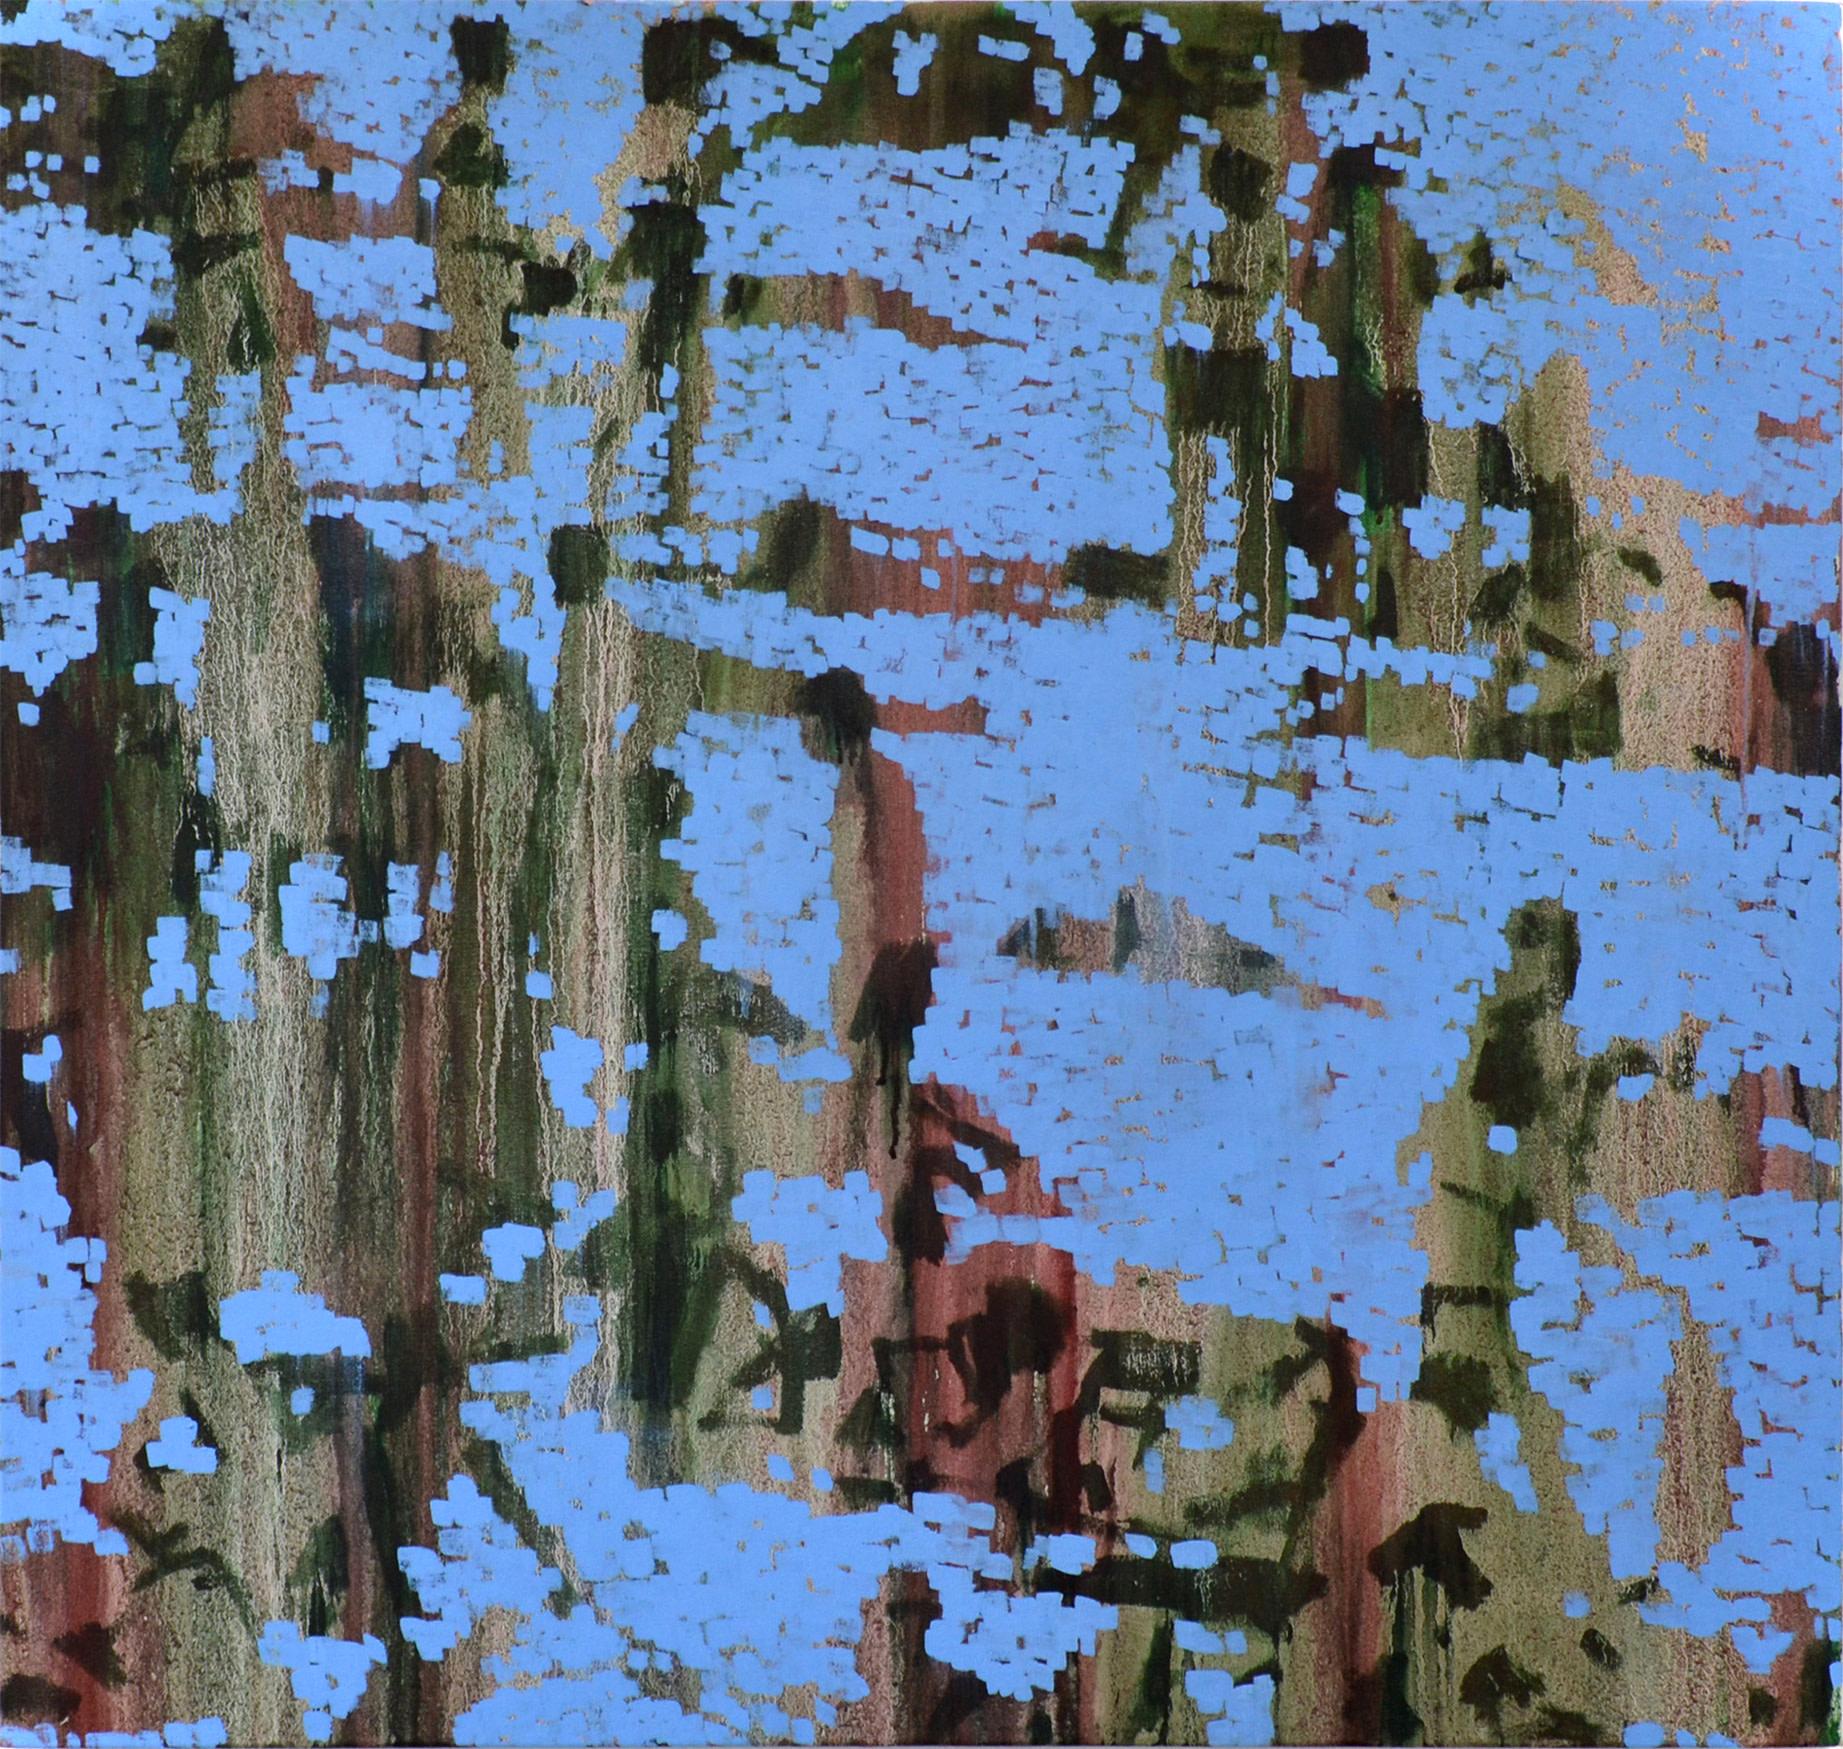 "<span class=""link fancybox-details-link""><a href=""/artists/42-nick-bodimeade/works/6386-nick-bodimeade-undertow-blue-2019/"">View Detail Page</a></span><div class=""artist""><strong>Nick Bodimeade</strong></div> (1957-) <div class=""title""><em>Undertow Blue</em>, 2019</div> <div class=""signed_and_dated"">signed, titled and dated on reverse</div> <div class=""medium"">oil on canvas</div> <div class=""dimensions"">86 x 92 cm</div><div class=""price"">£2,100.00</div><div class=""copyright_line"">OwnArt: £ 210 x 10 Months, 0% APR</div>"